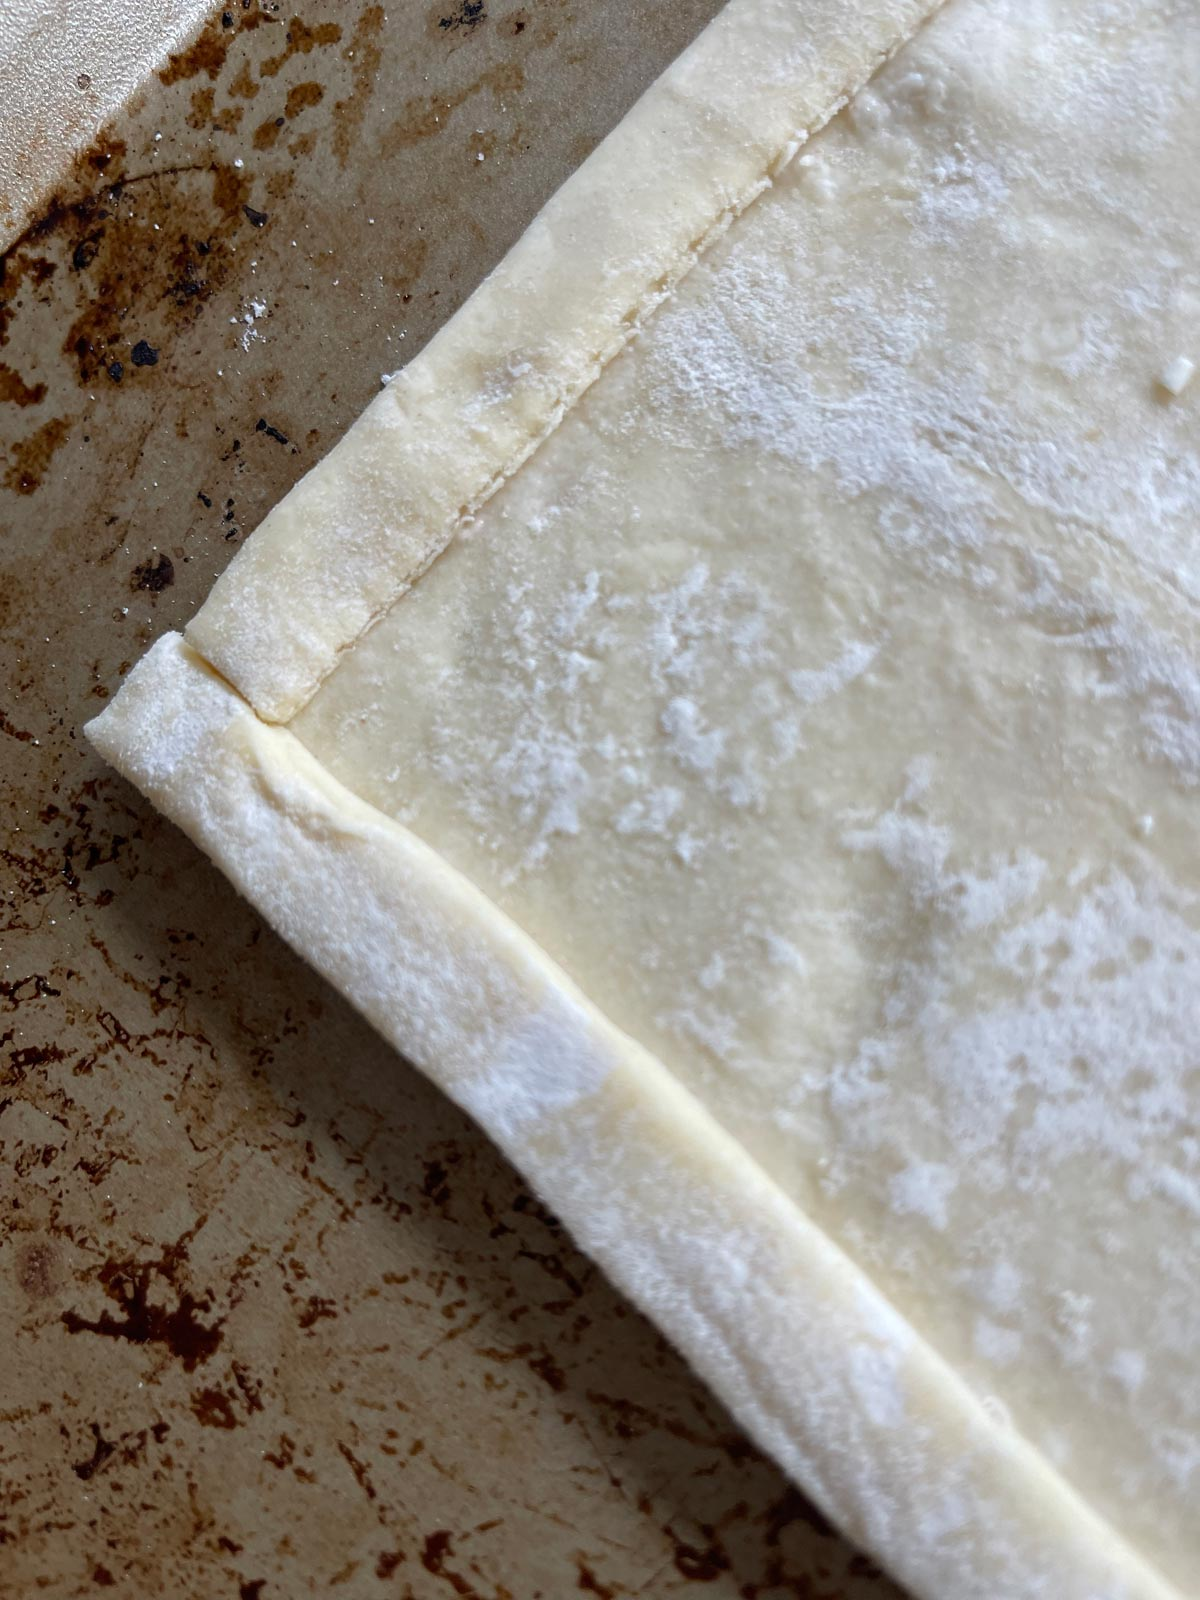 Raised edge of puff pastry